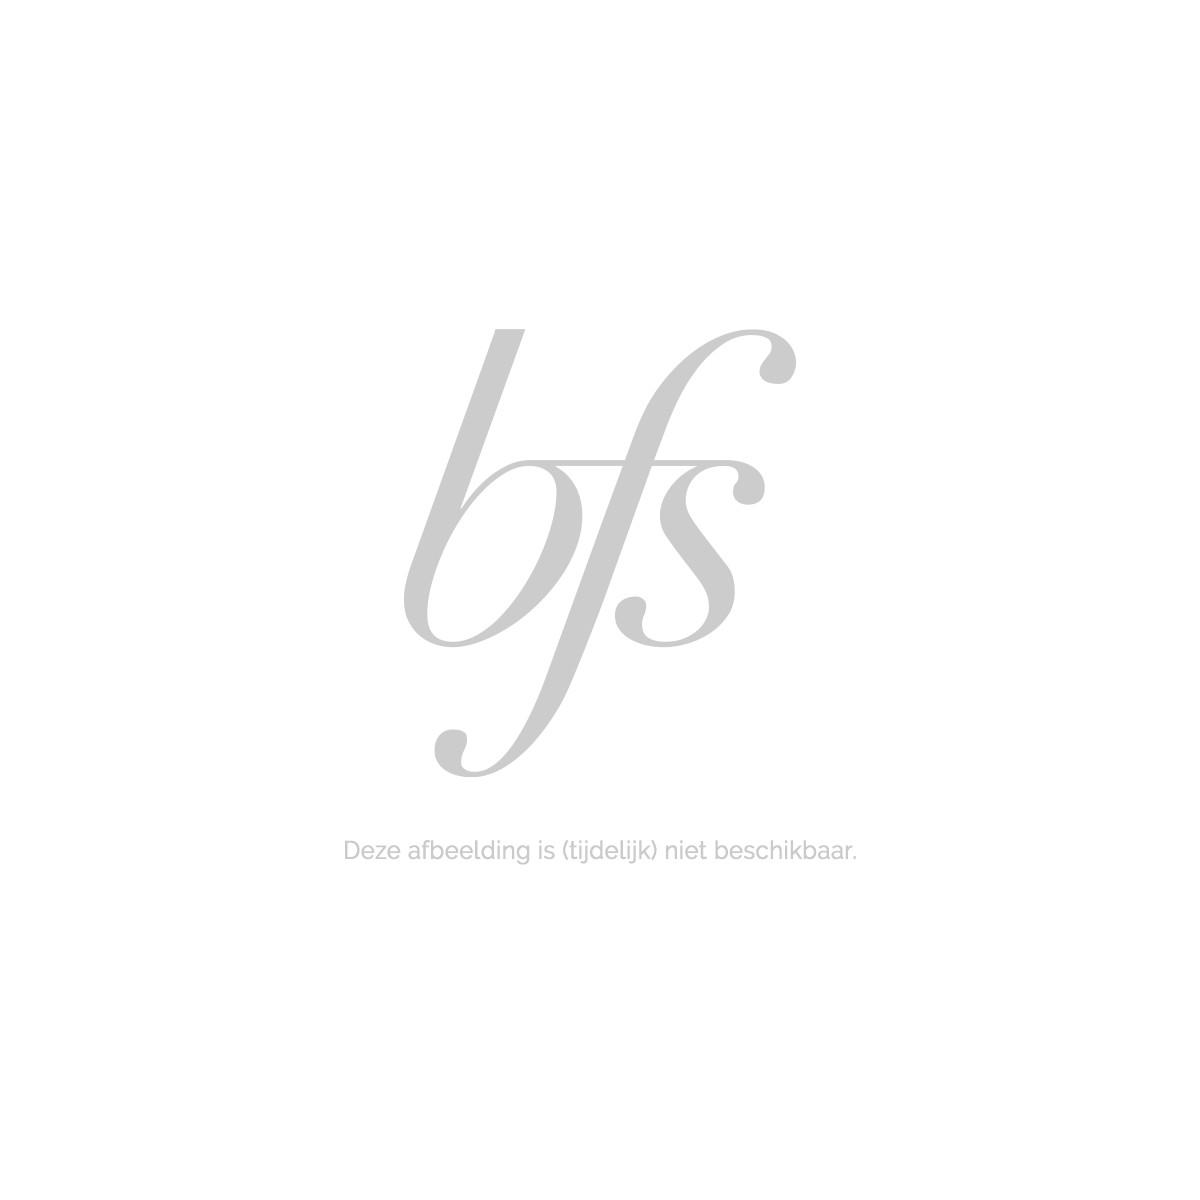 Biomaris Skin Cream Classic 50 Ml Tube Without Perfume